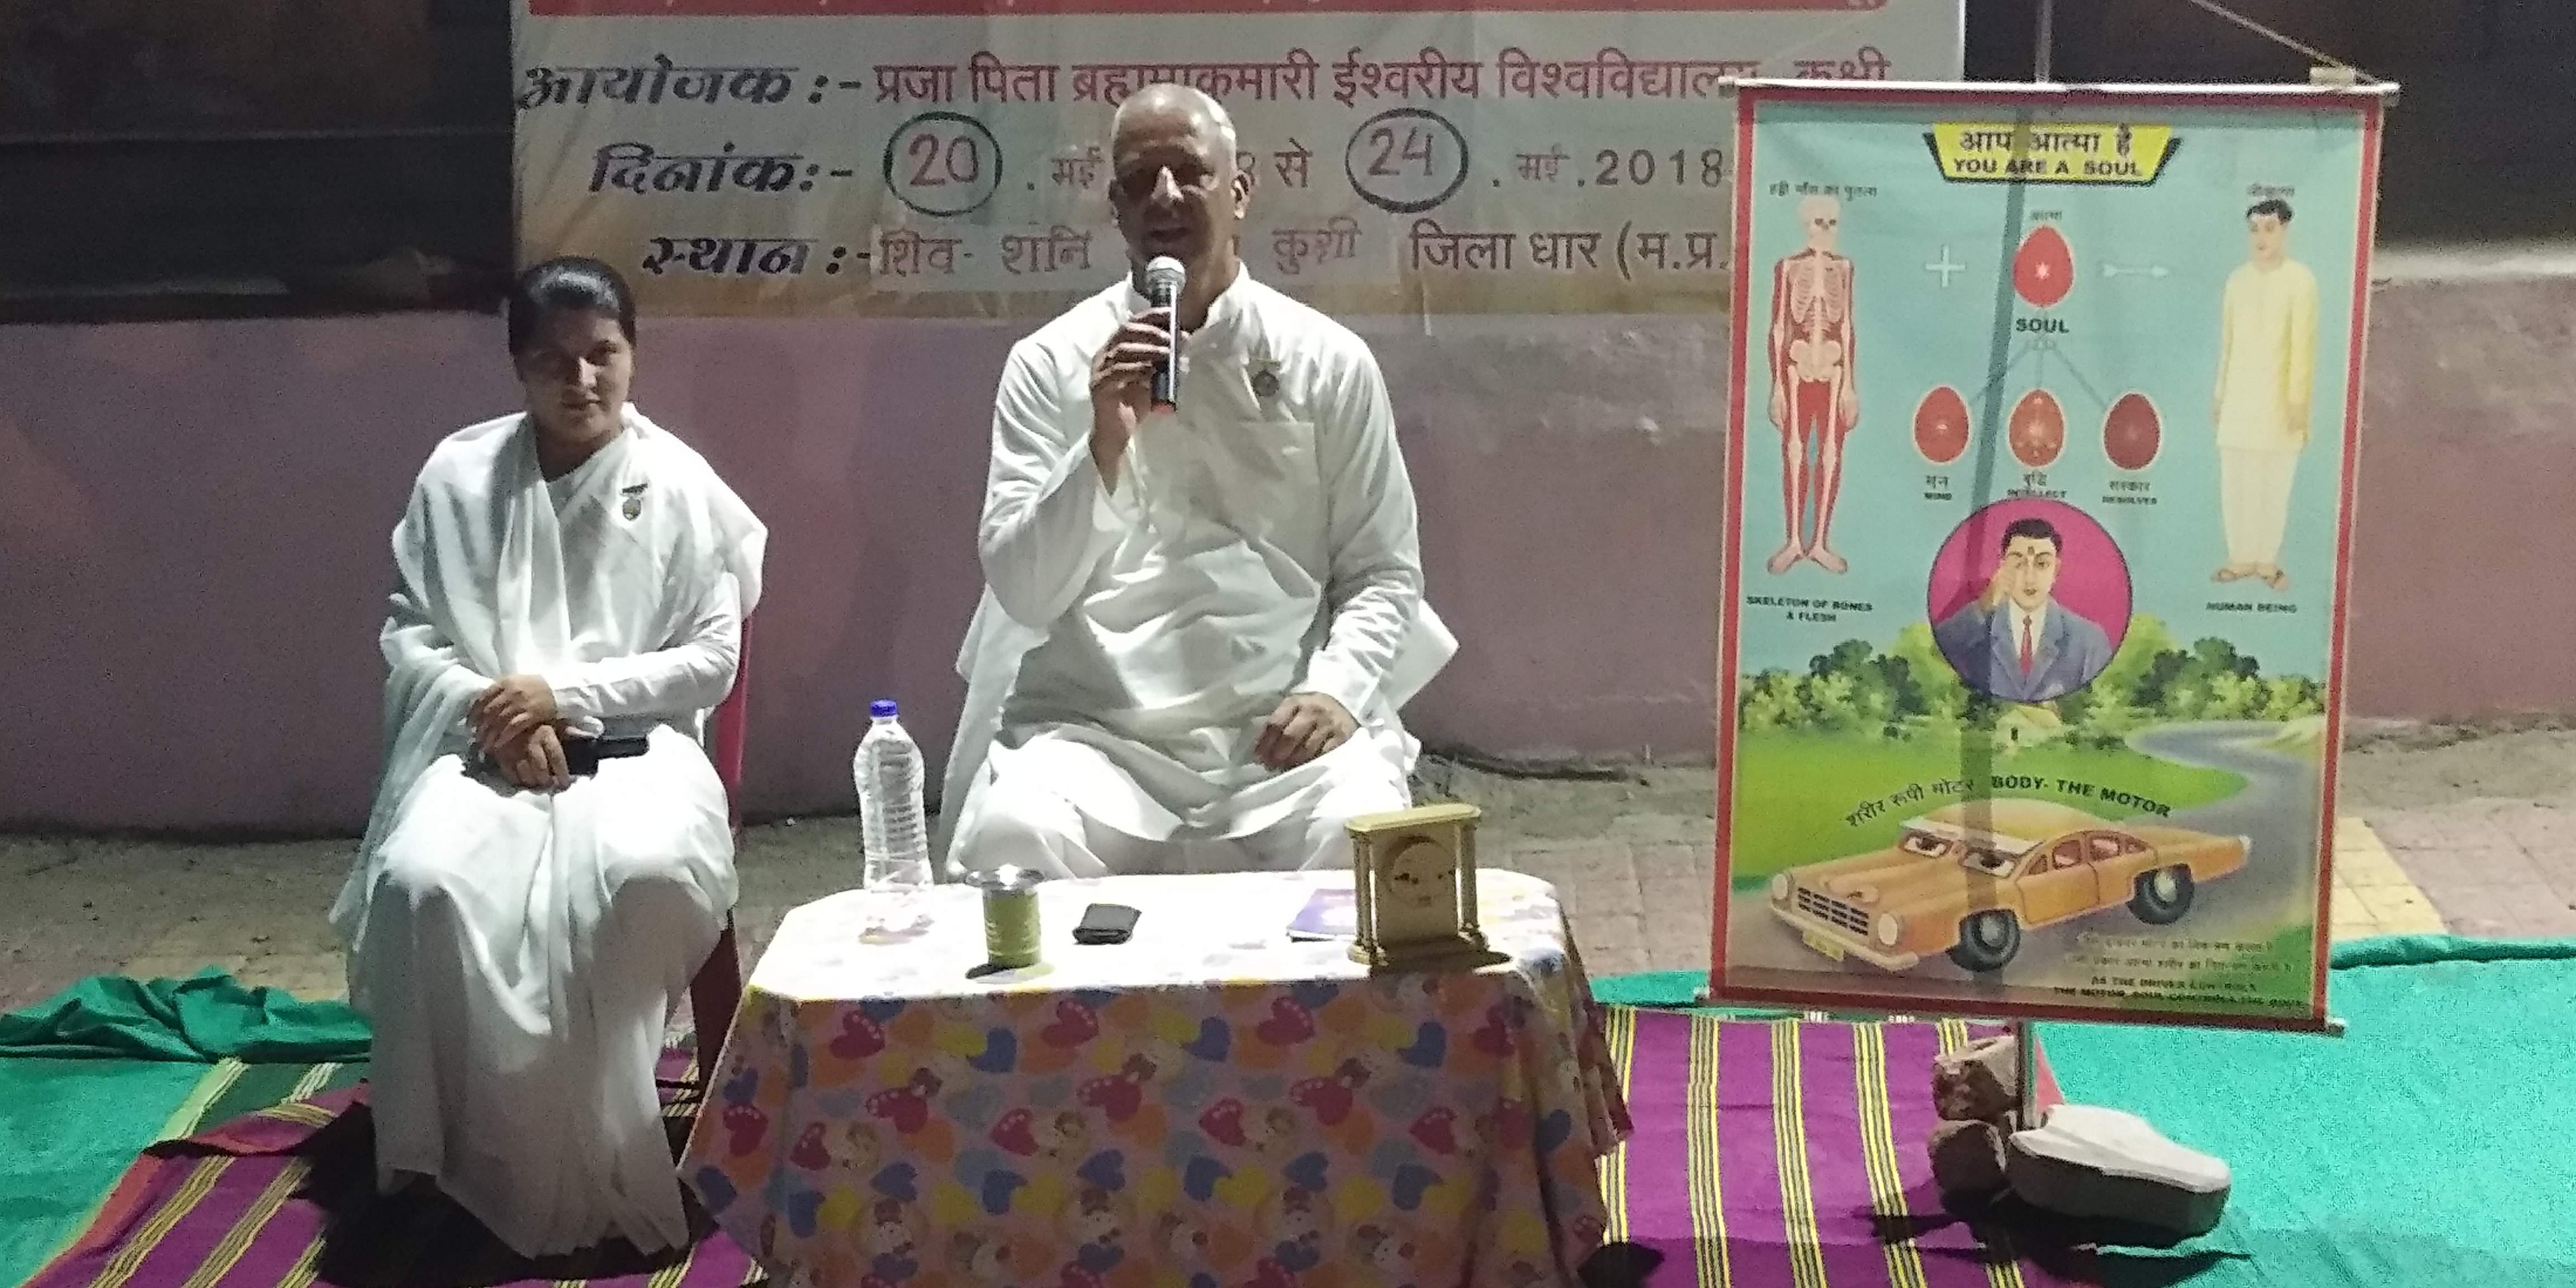 5 Day Peaceful Mind and a Joyful Life Camp at Dhar, Madhya Pradesh